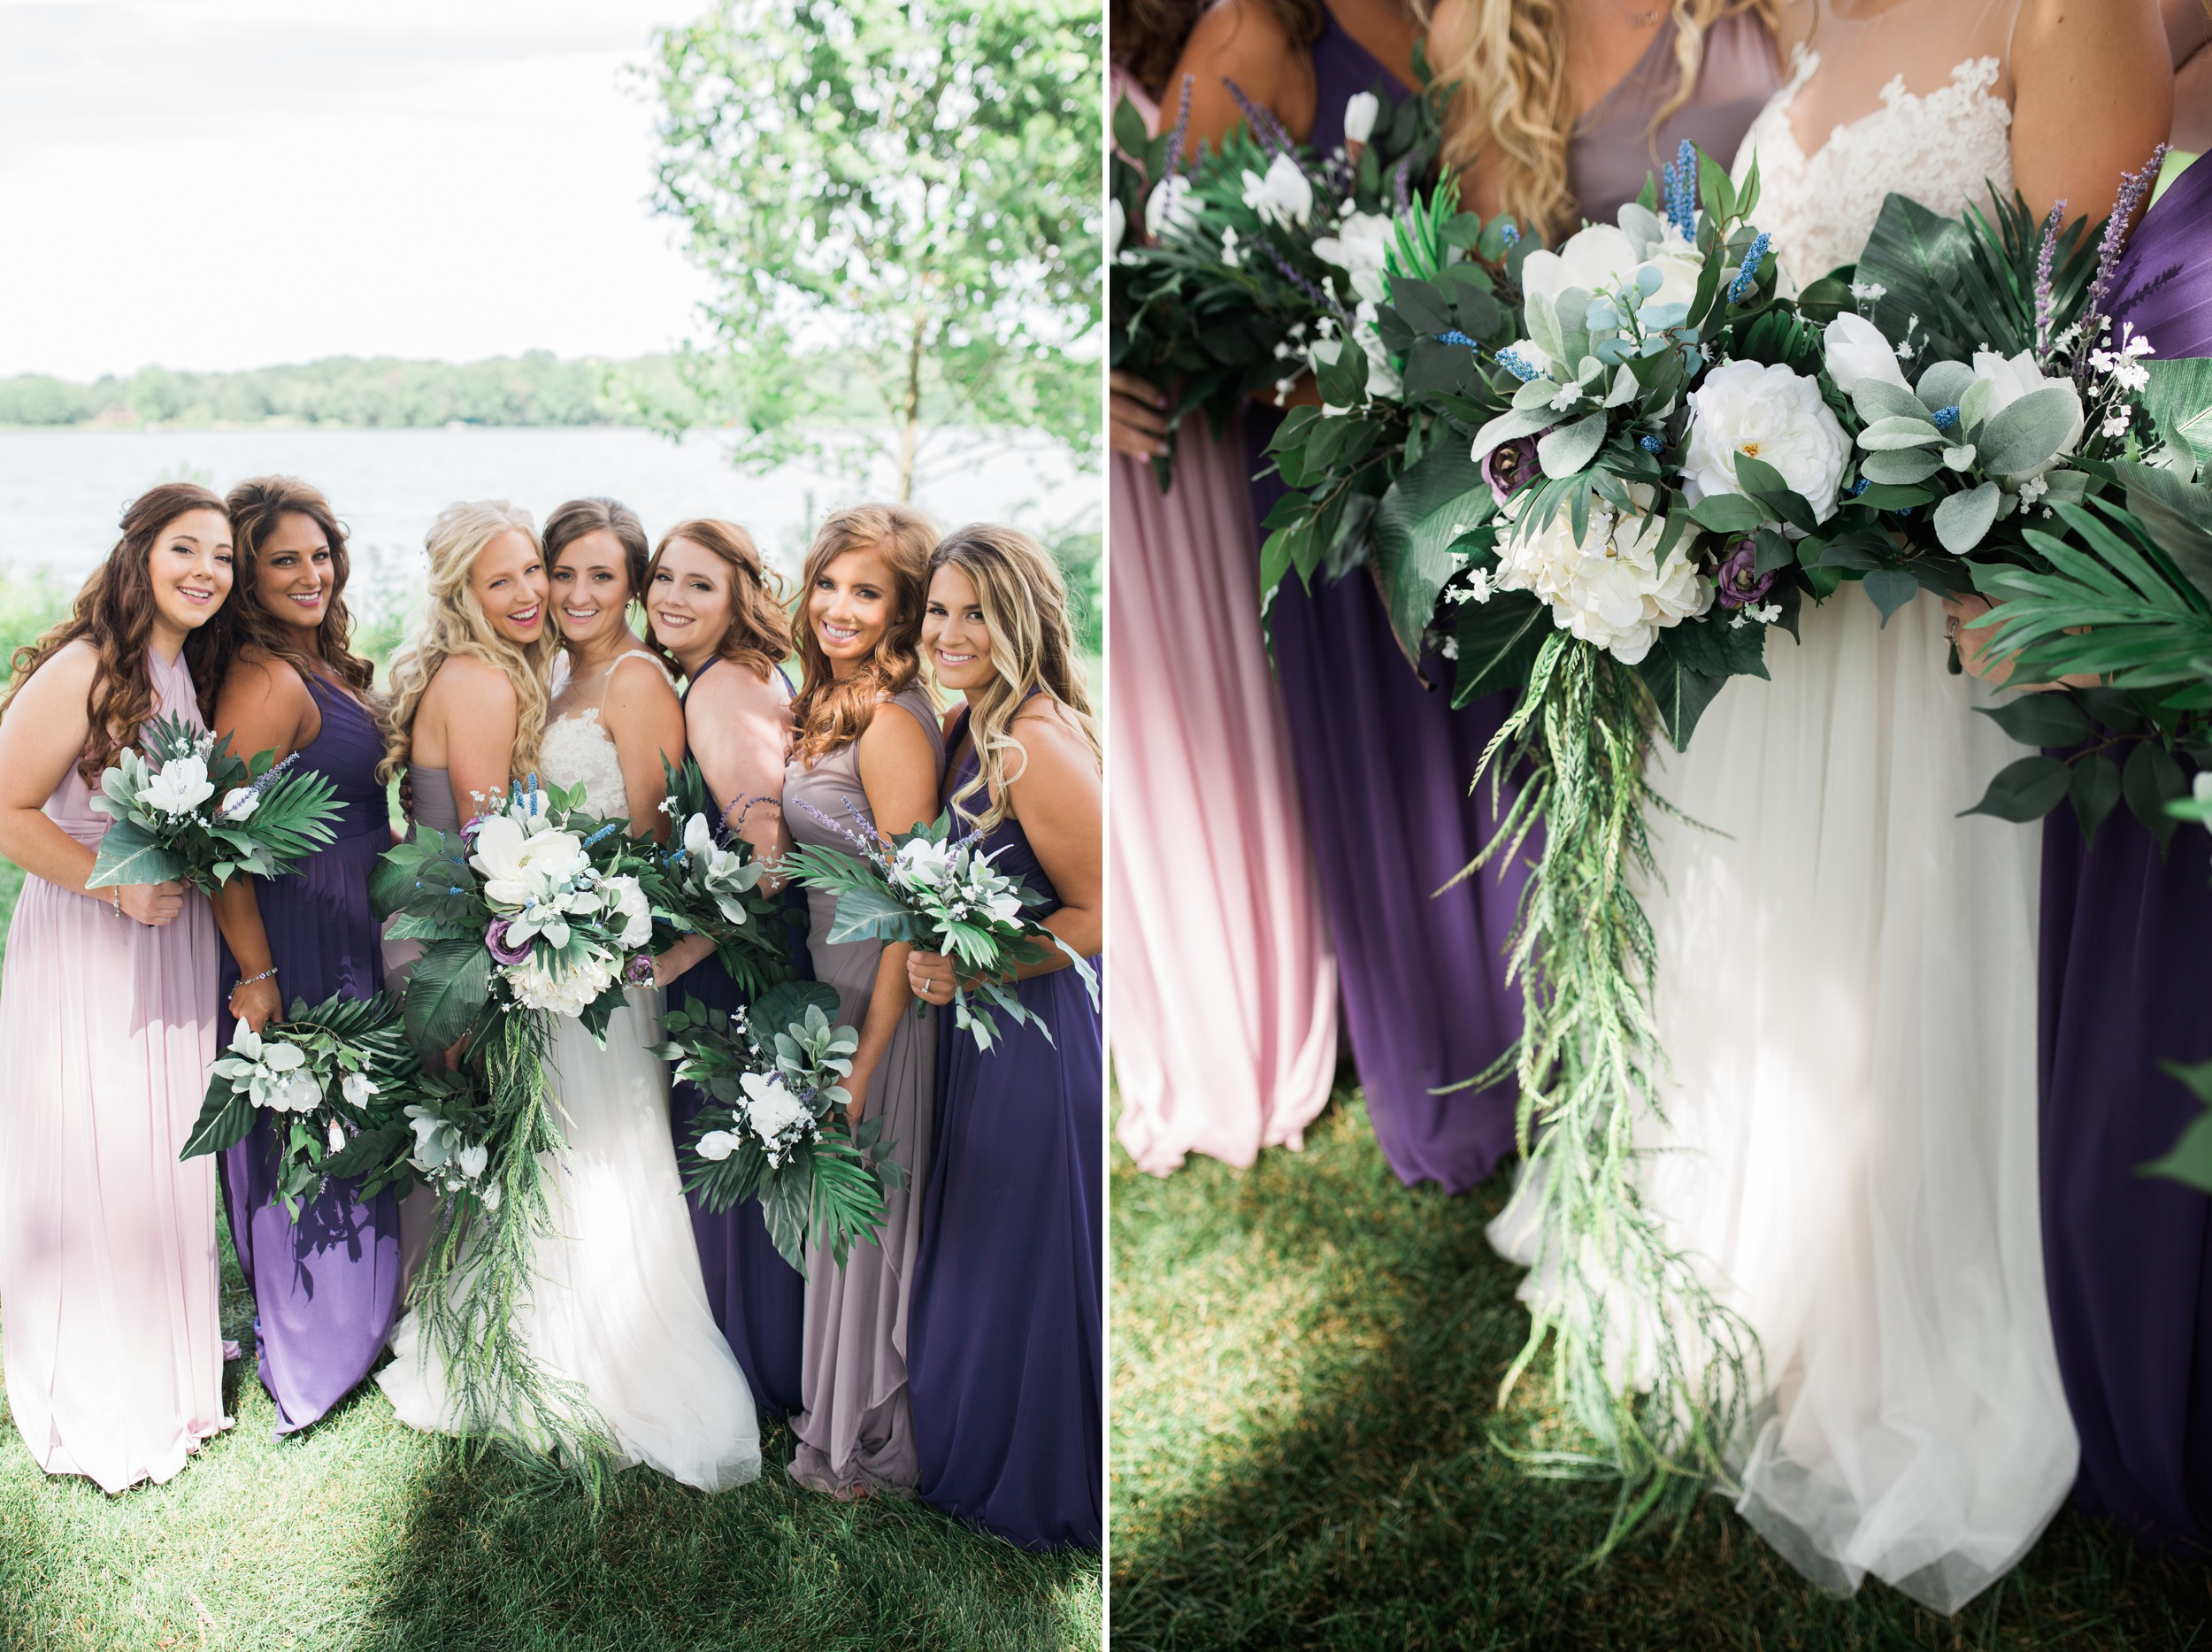 Nick-and-martina-pinelake-vinyards-wedding-columbiana-ohio-tracylynn-photography 8.jpg